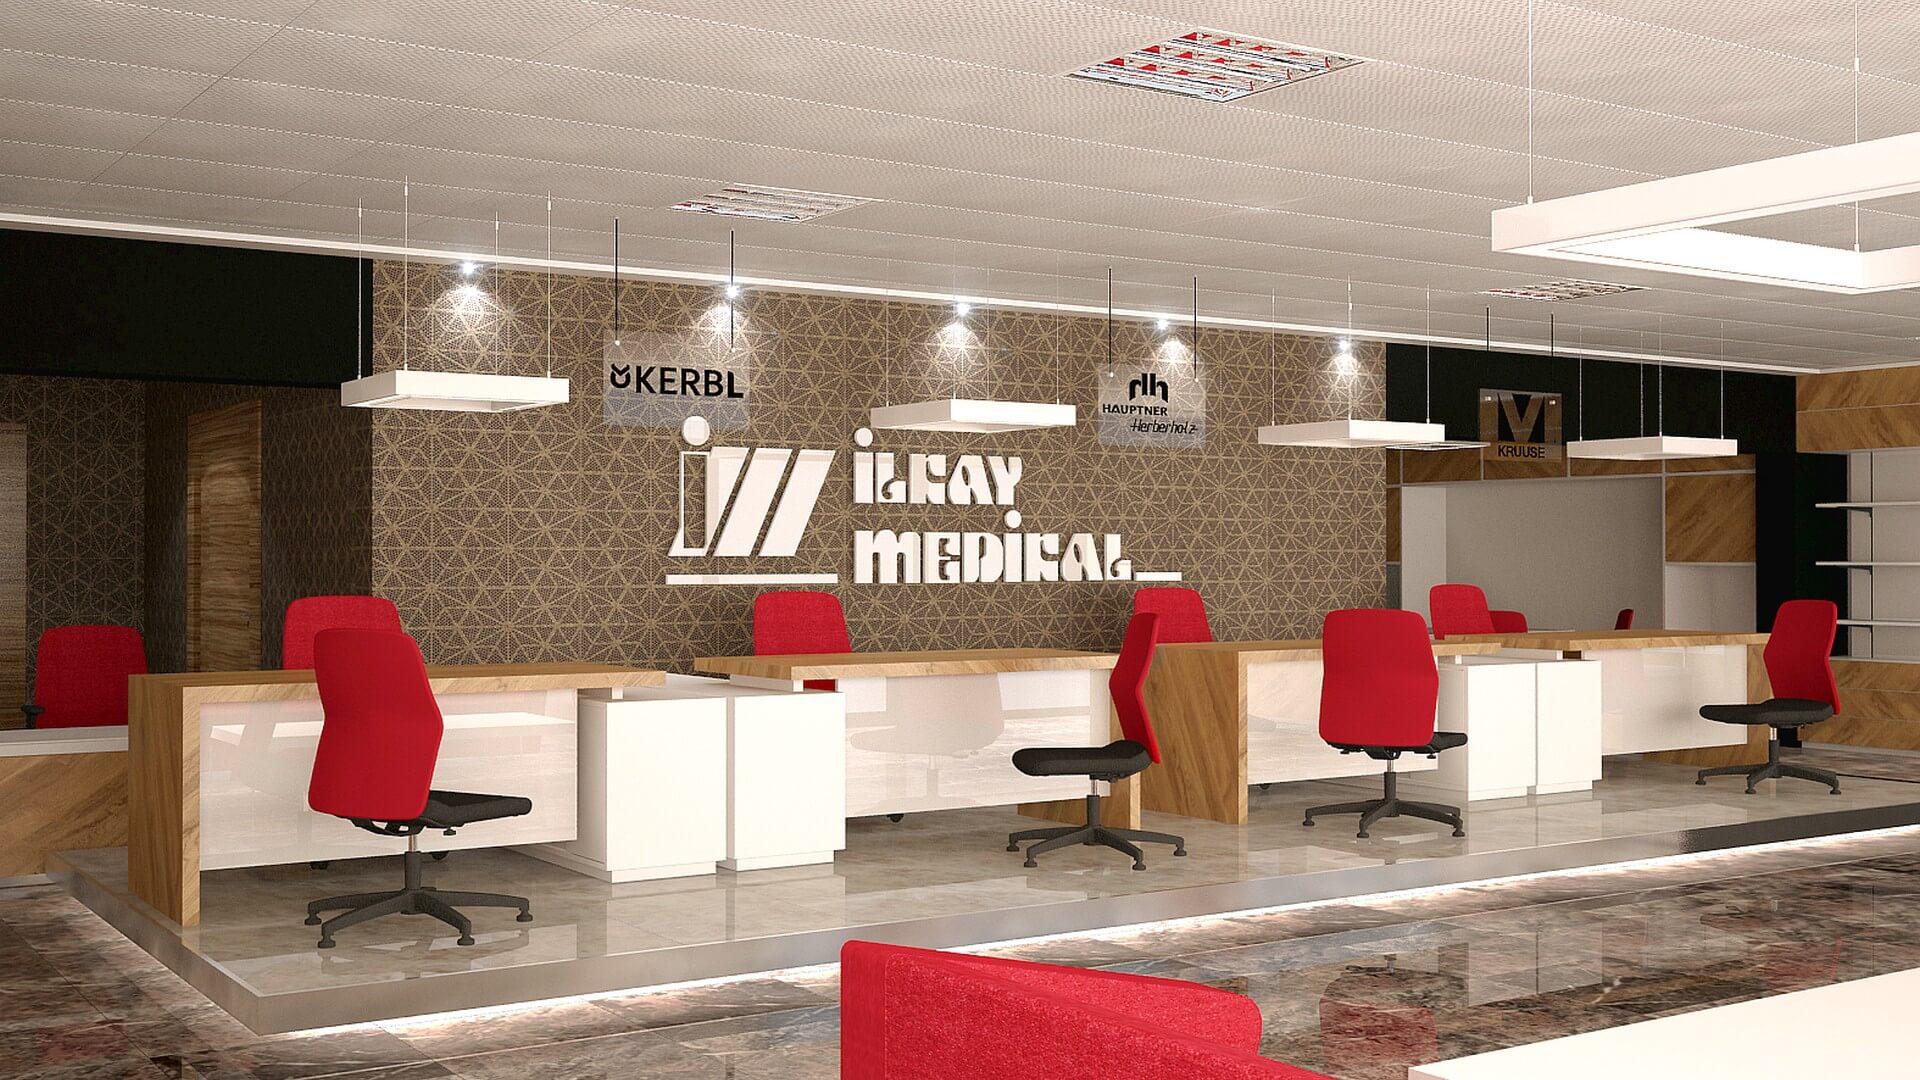 Ilkay Medical Shop, Retail